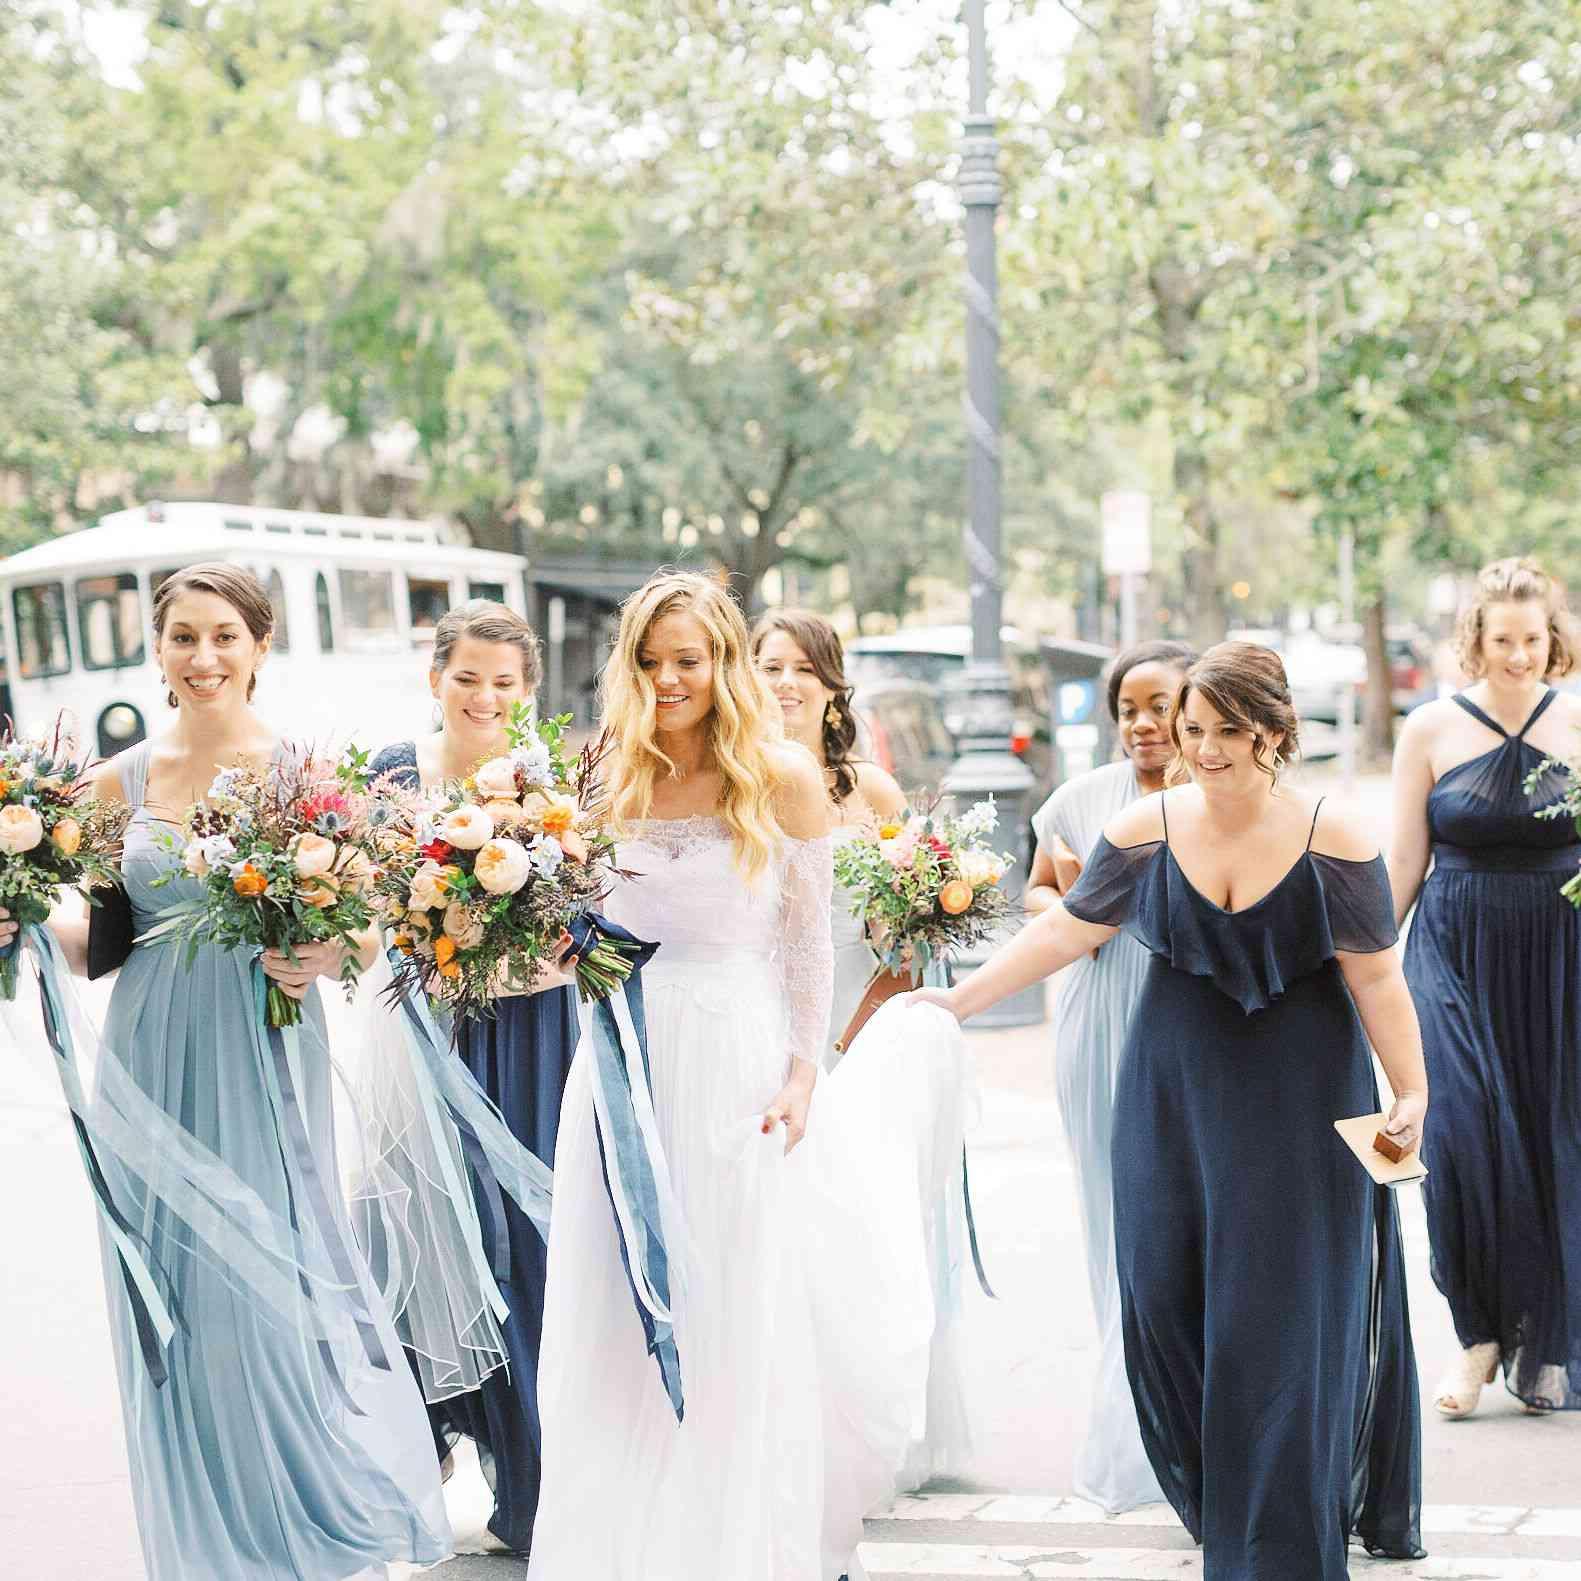 whimsical savannah wedding, bride with bridal party